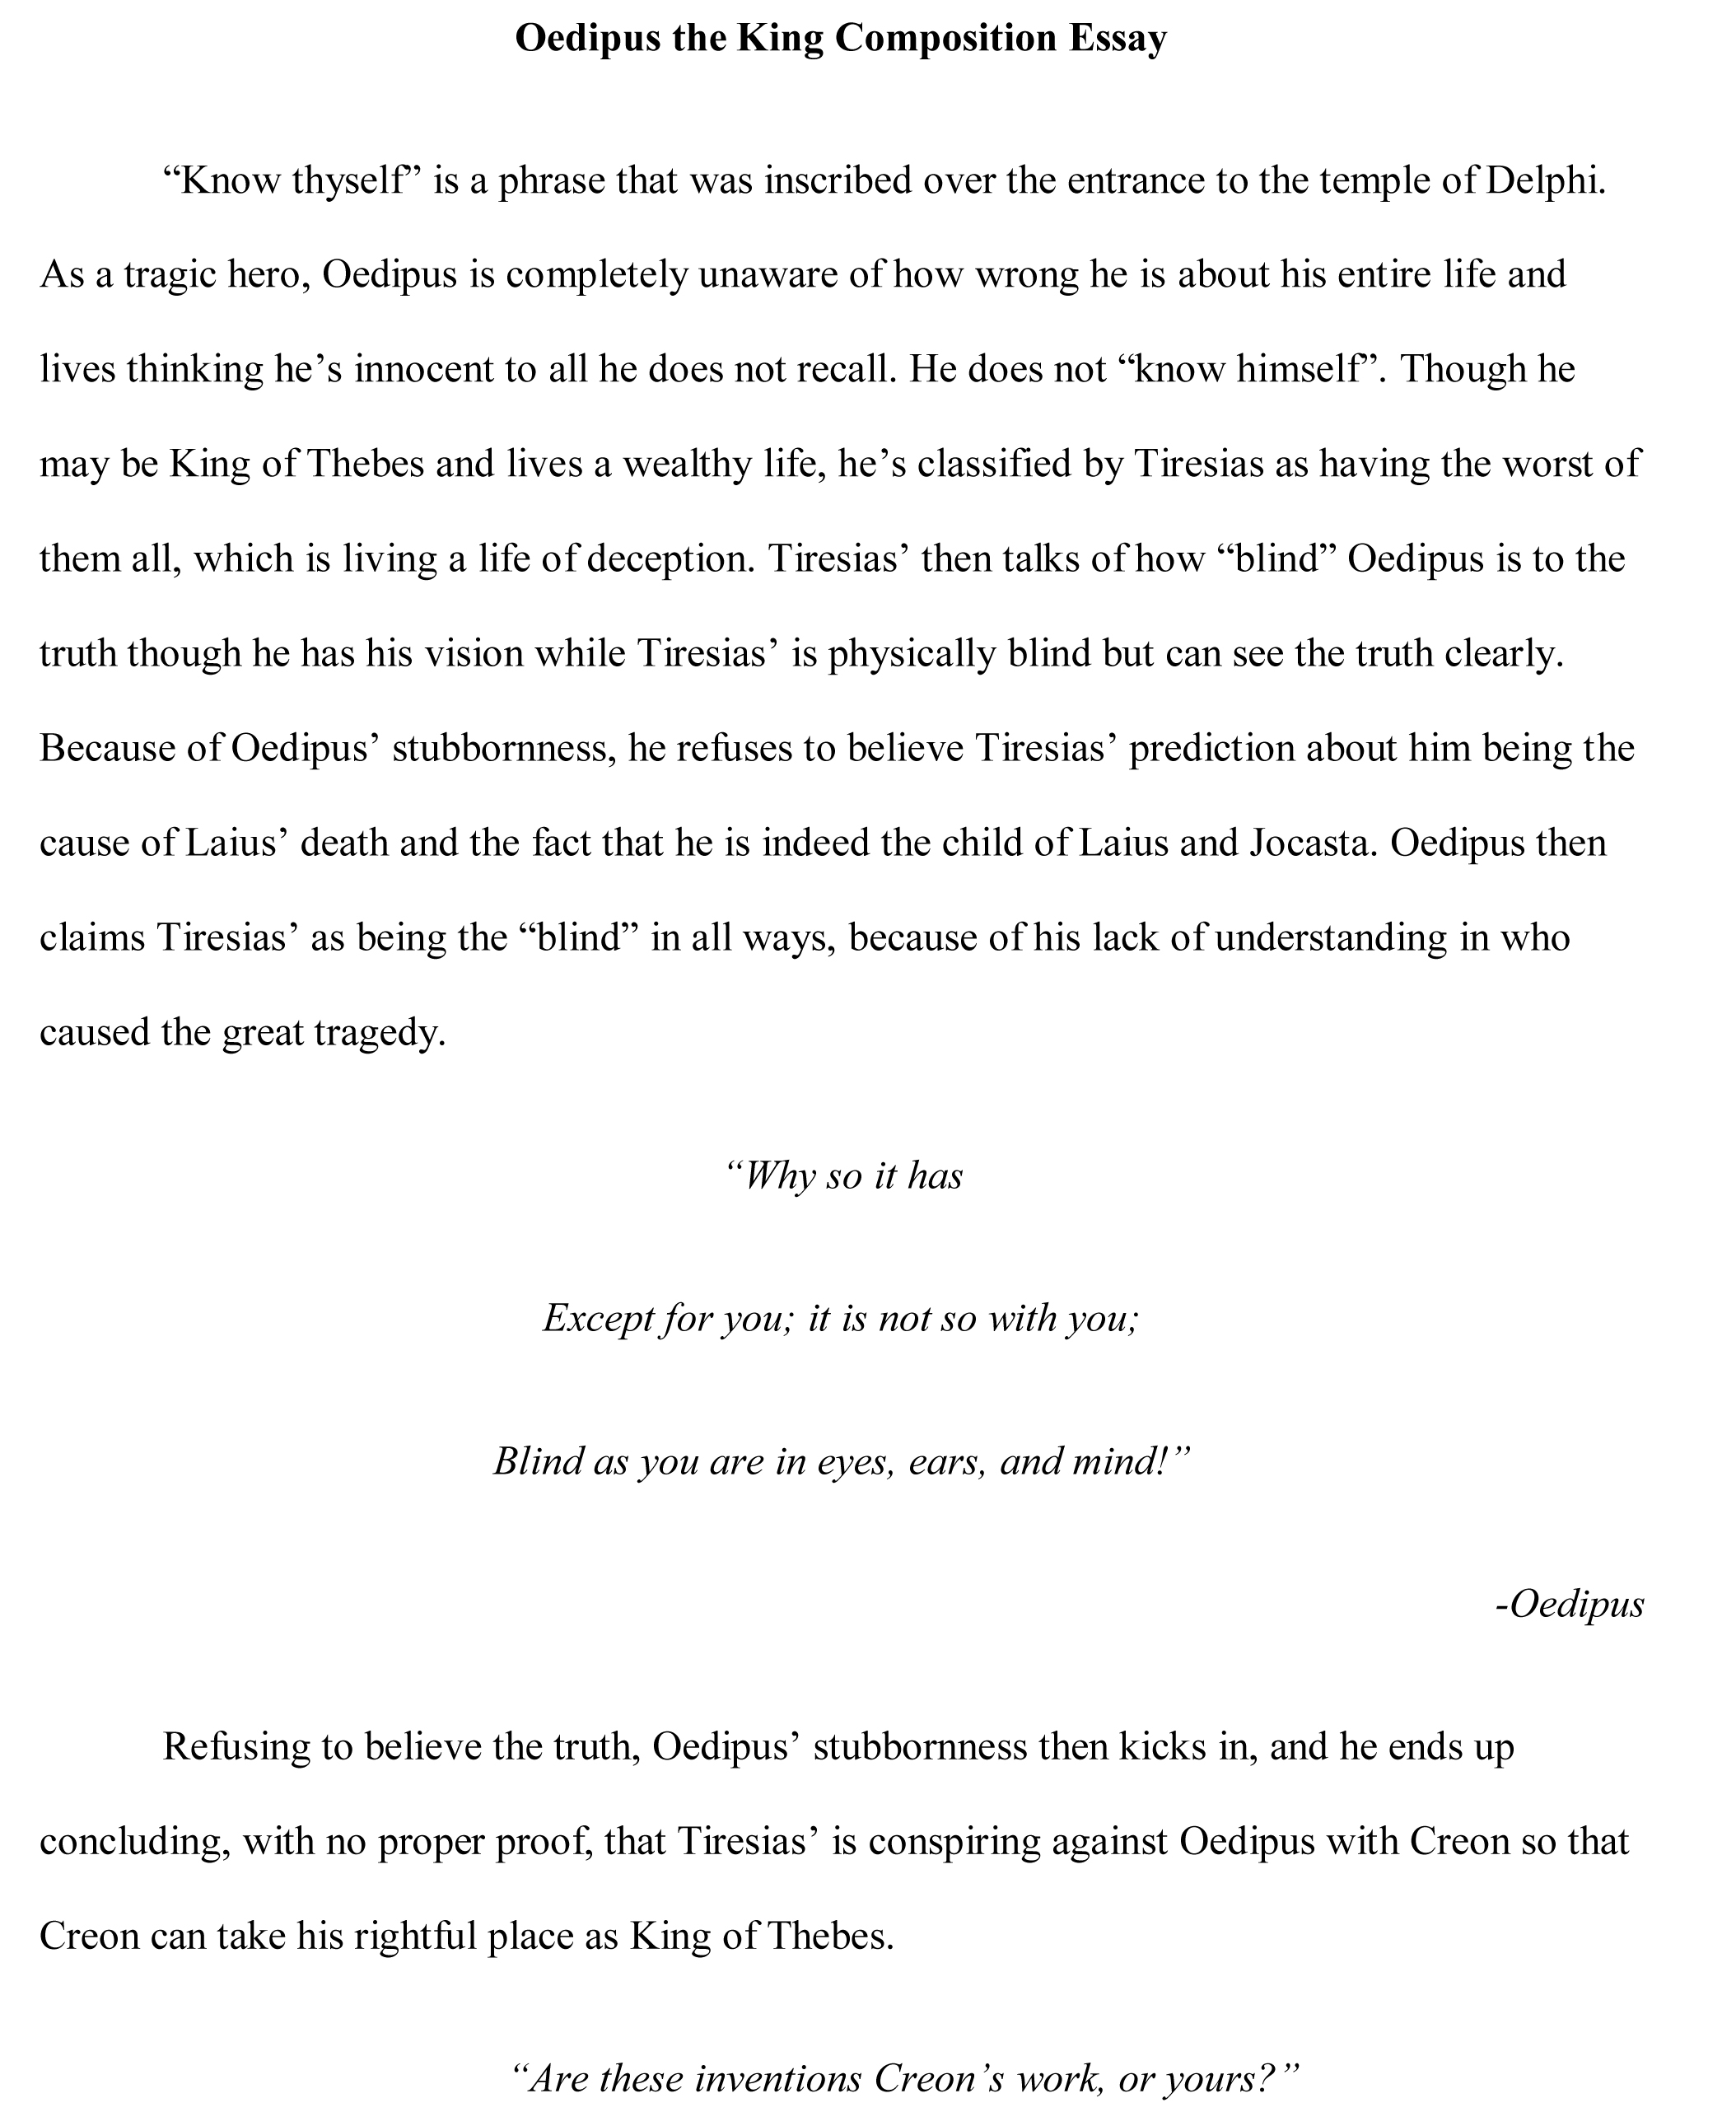 014 Paragraph Essay Generator Example Oedipus Free Unbelievable 5 Full